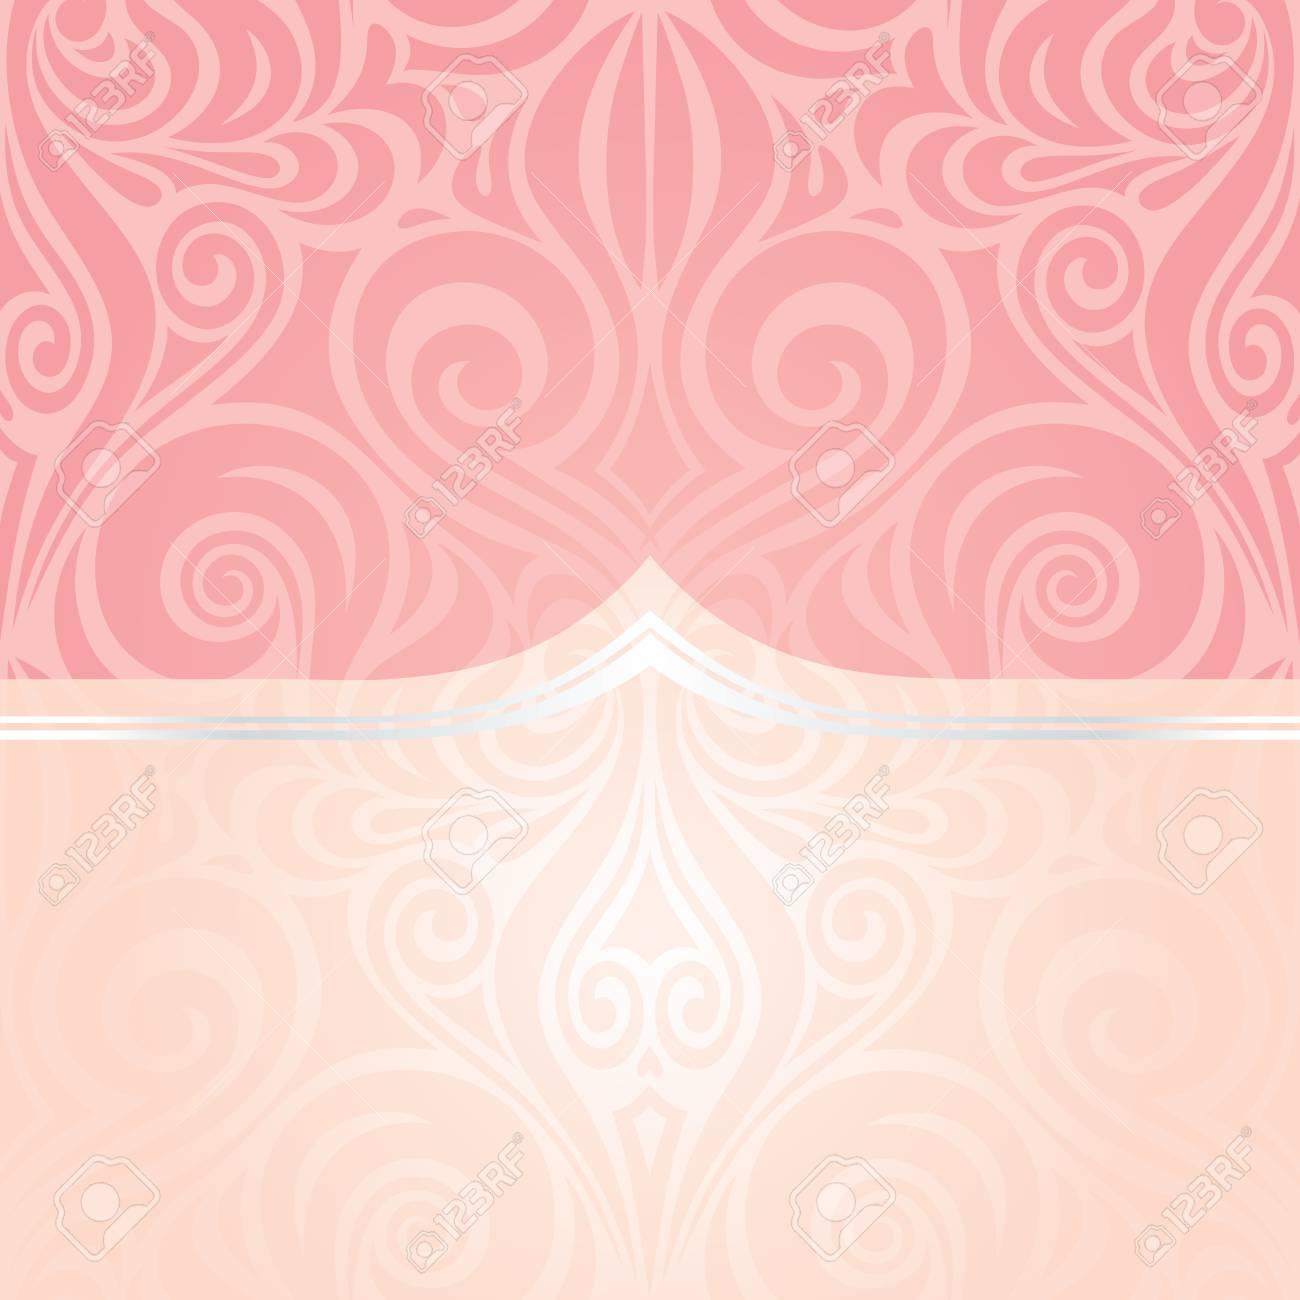 Pink Silver Wedding Retro Decorative Invitation Vector Wallpaper Trendy Fashion Mandala Design With Copy Space